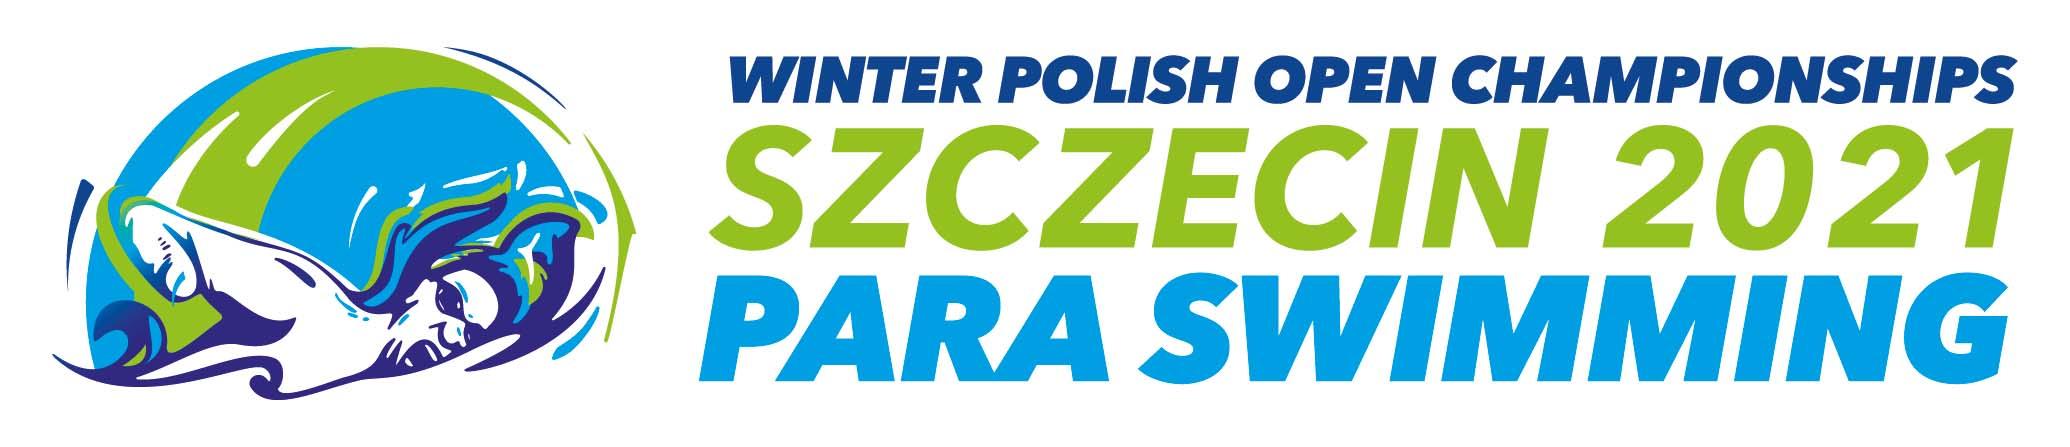 Winter Polish Open